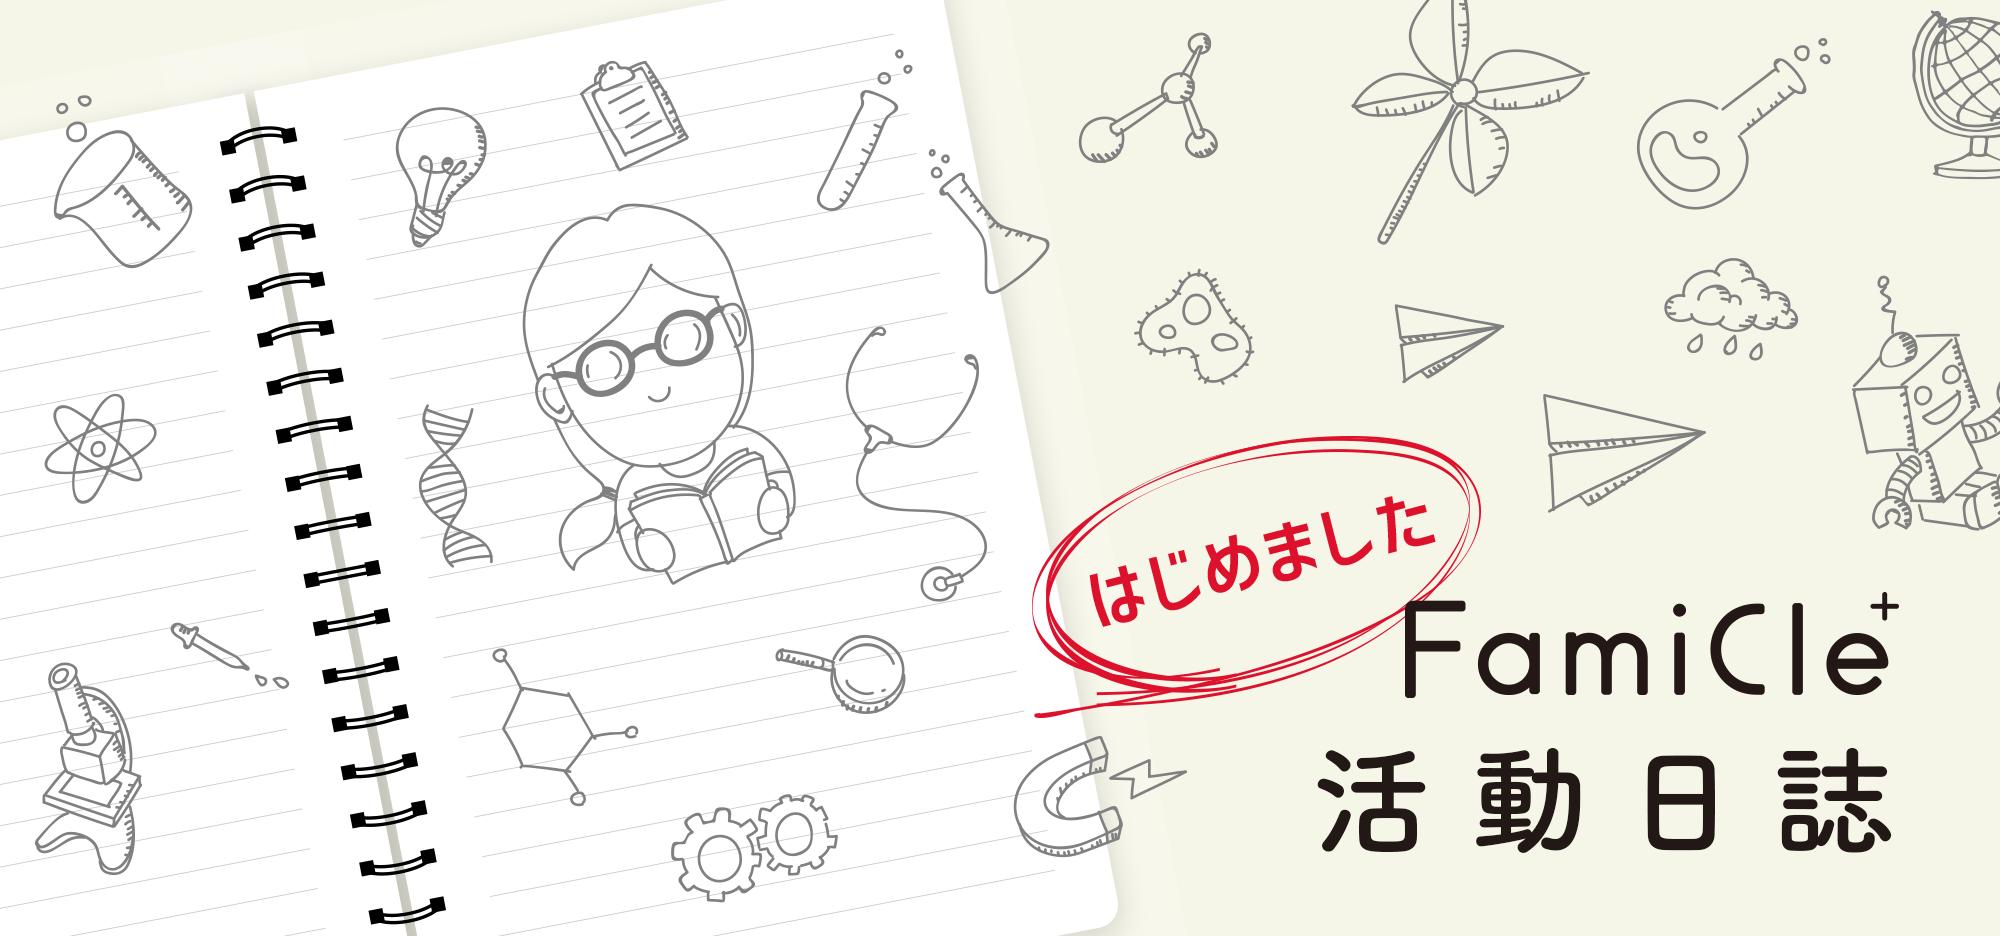 FamiCle+活動日誌